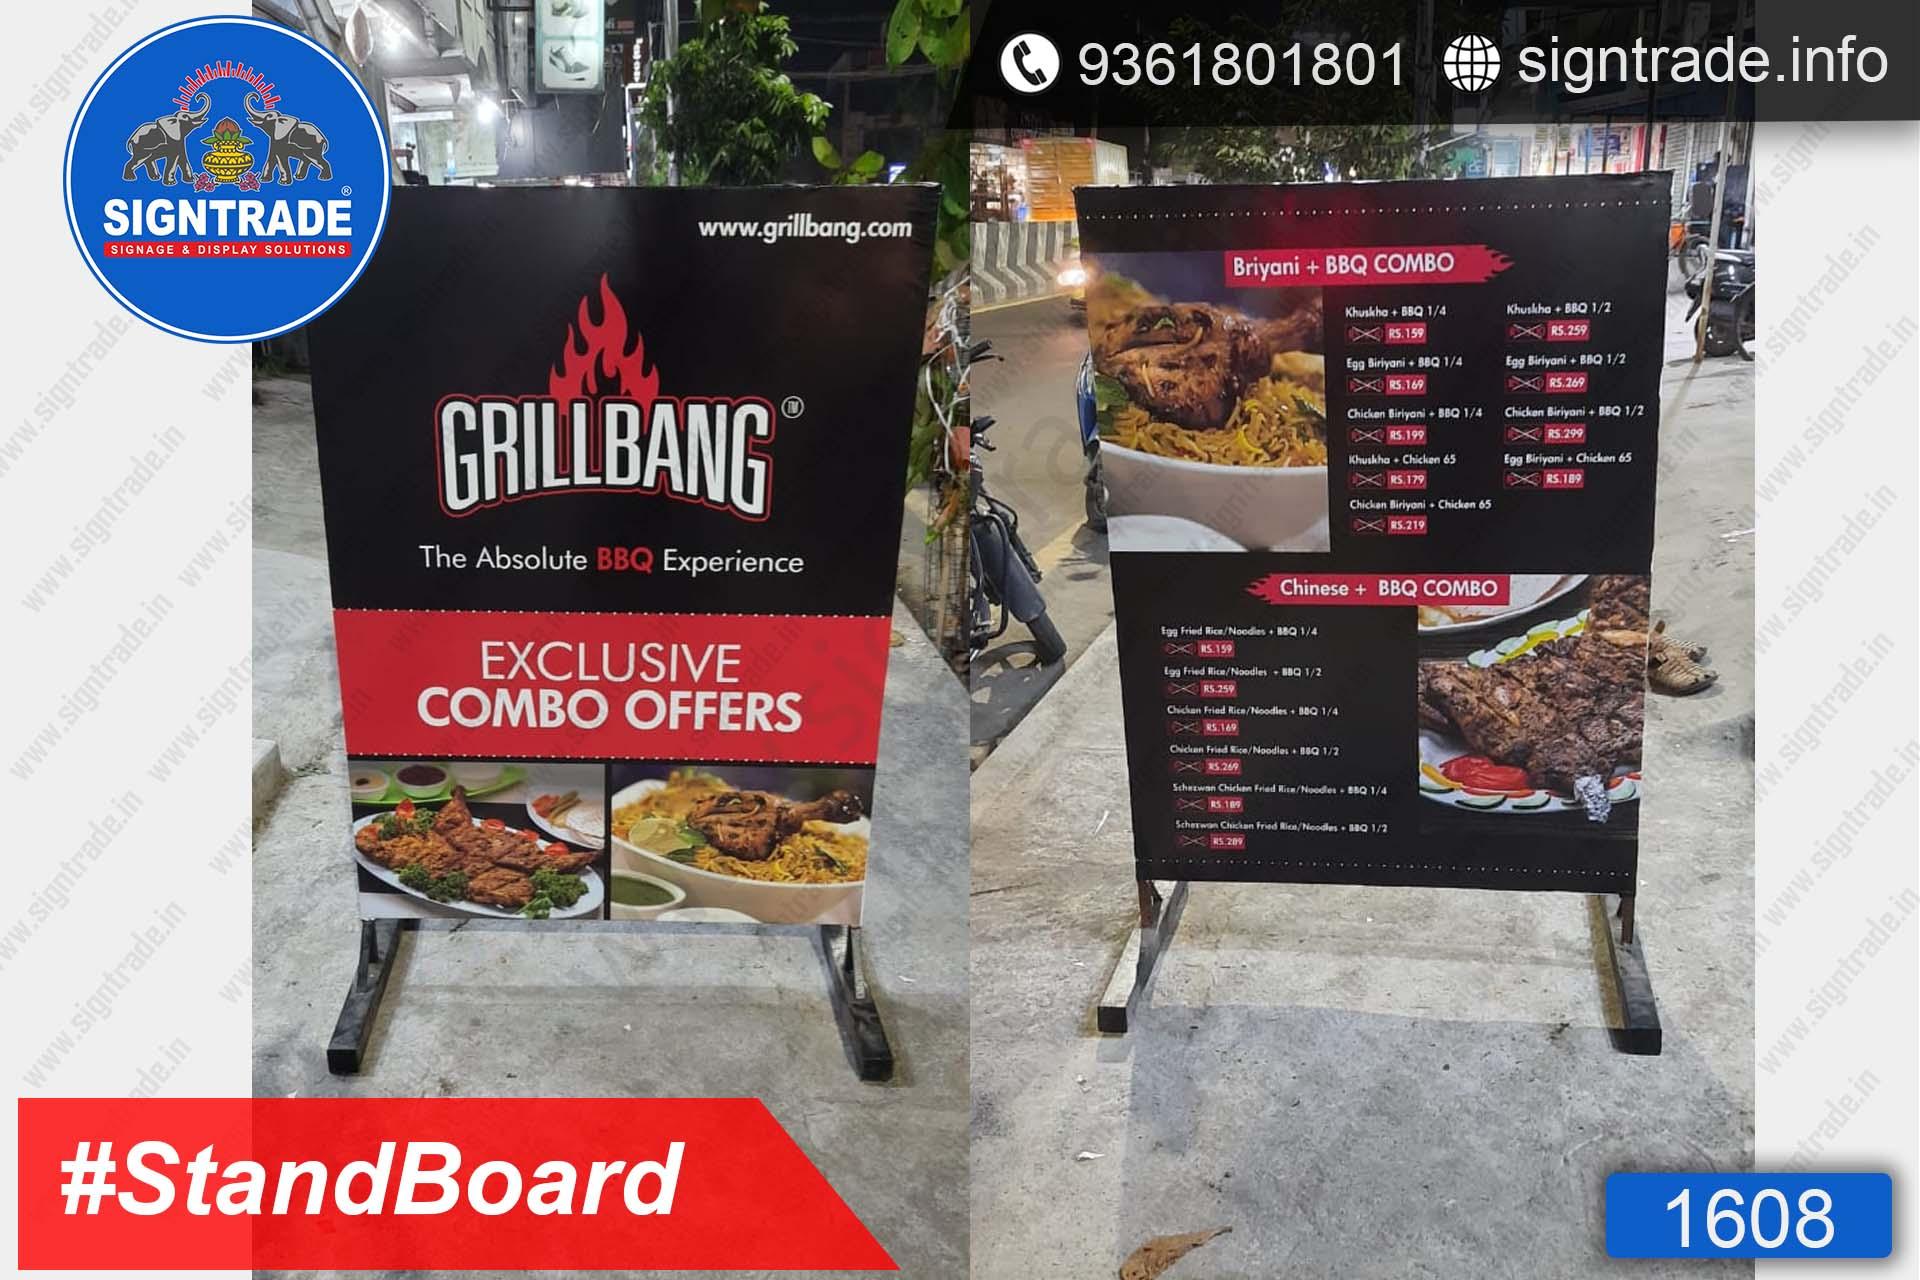 GrillBang, Madipakkam, Chennai - SIGNTRADE - Stand Up Flex Board - Digital Printing Services in Chennai